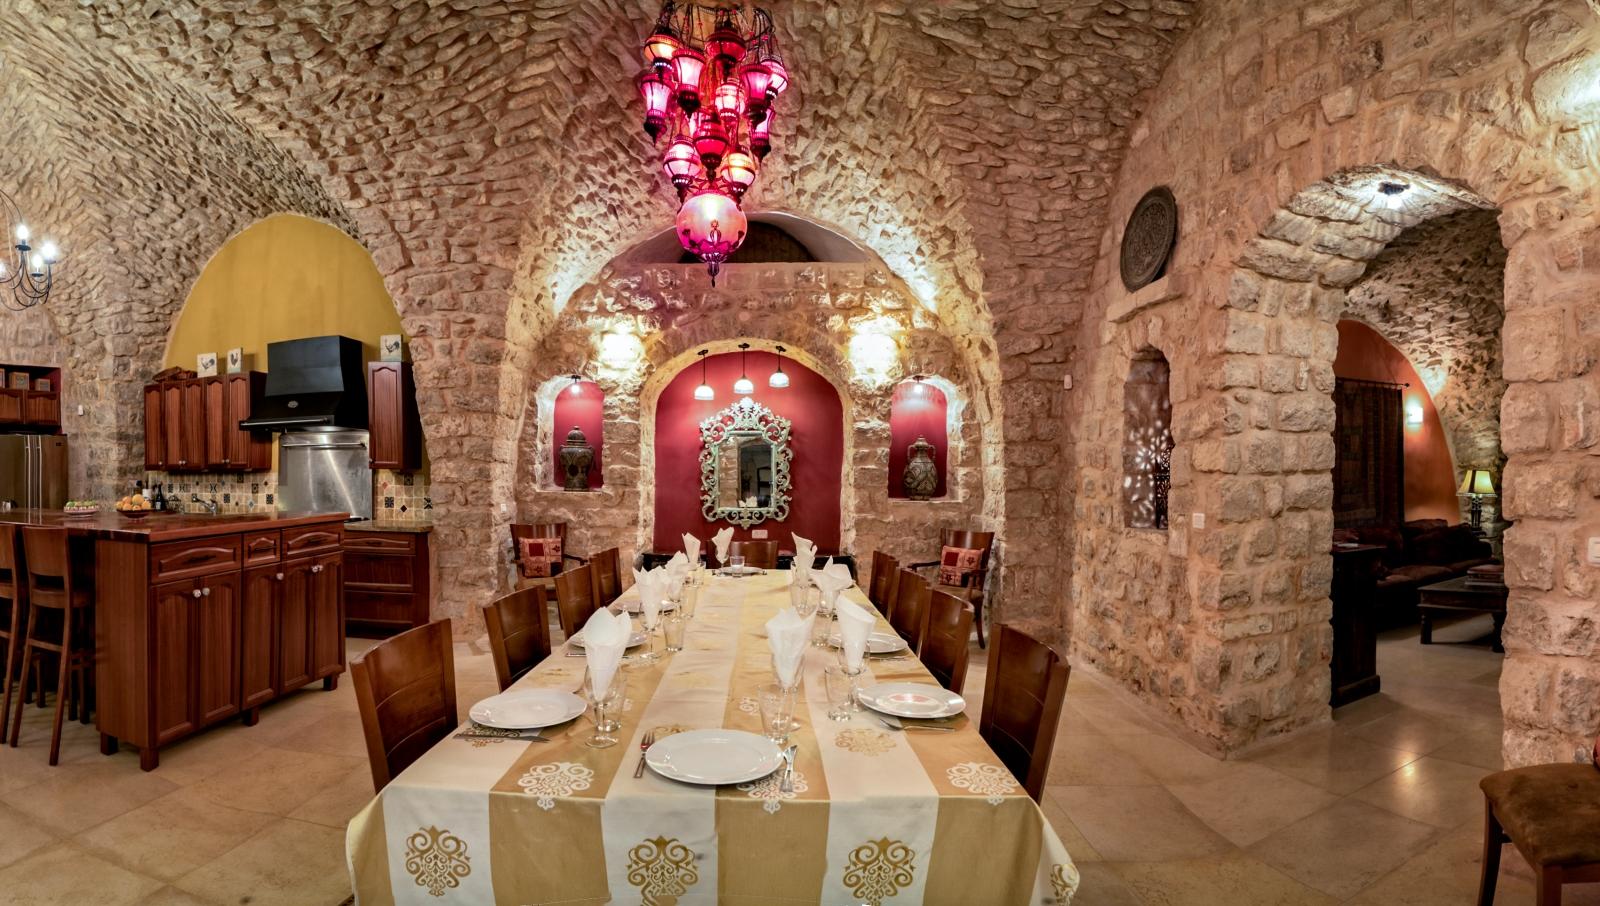 Villa Tiferet offers a heritage setting for short-term stays. Photo by Jordan Polevoy